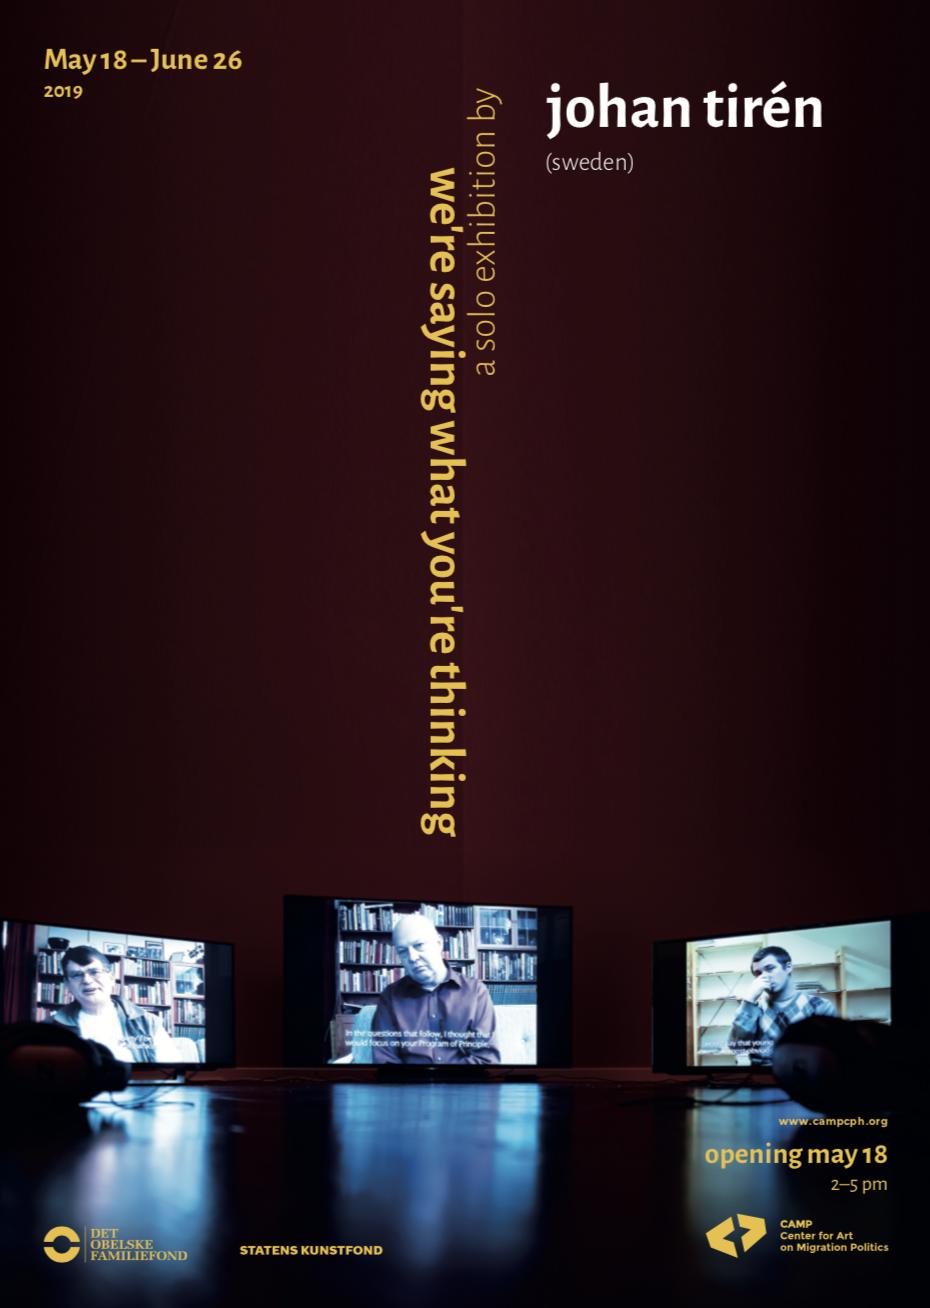 Poster design: Tiago Gonçalves